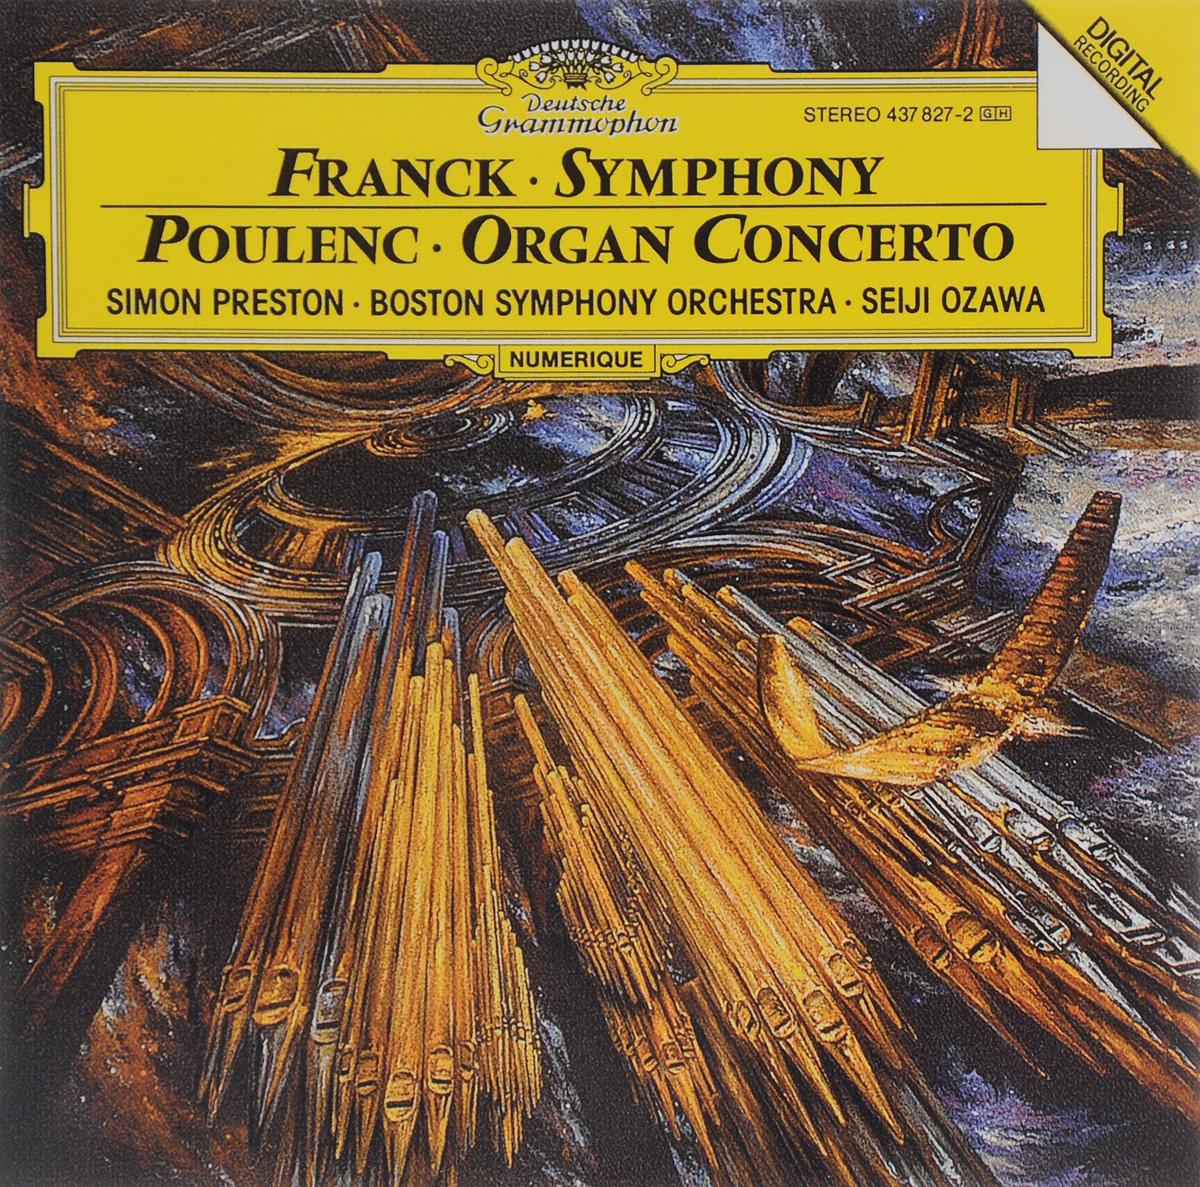 Сейджи Озава,Boston Symphony Orchestra Seiji Ozawa. Franck. Symphony / Poulenc. Organ Concerto sushi by seiji